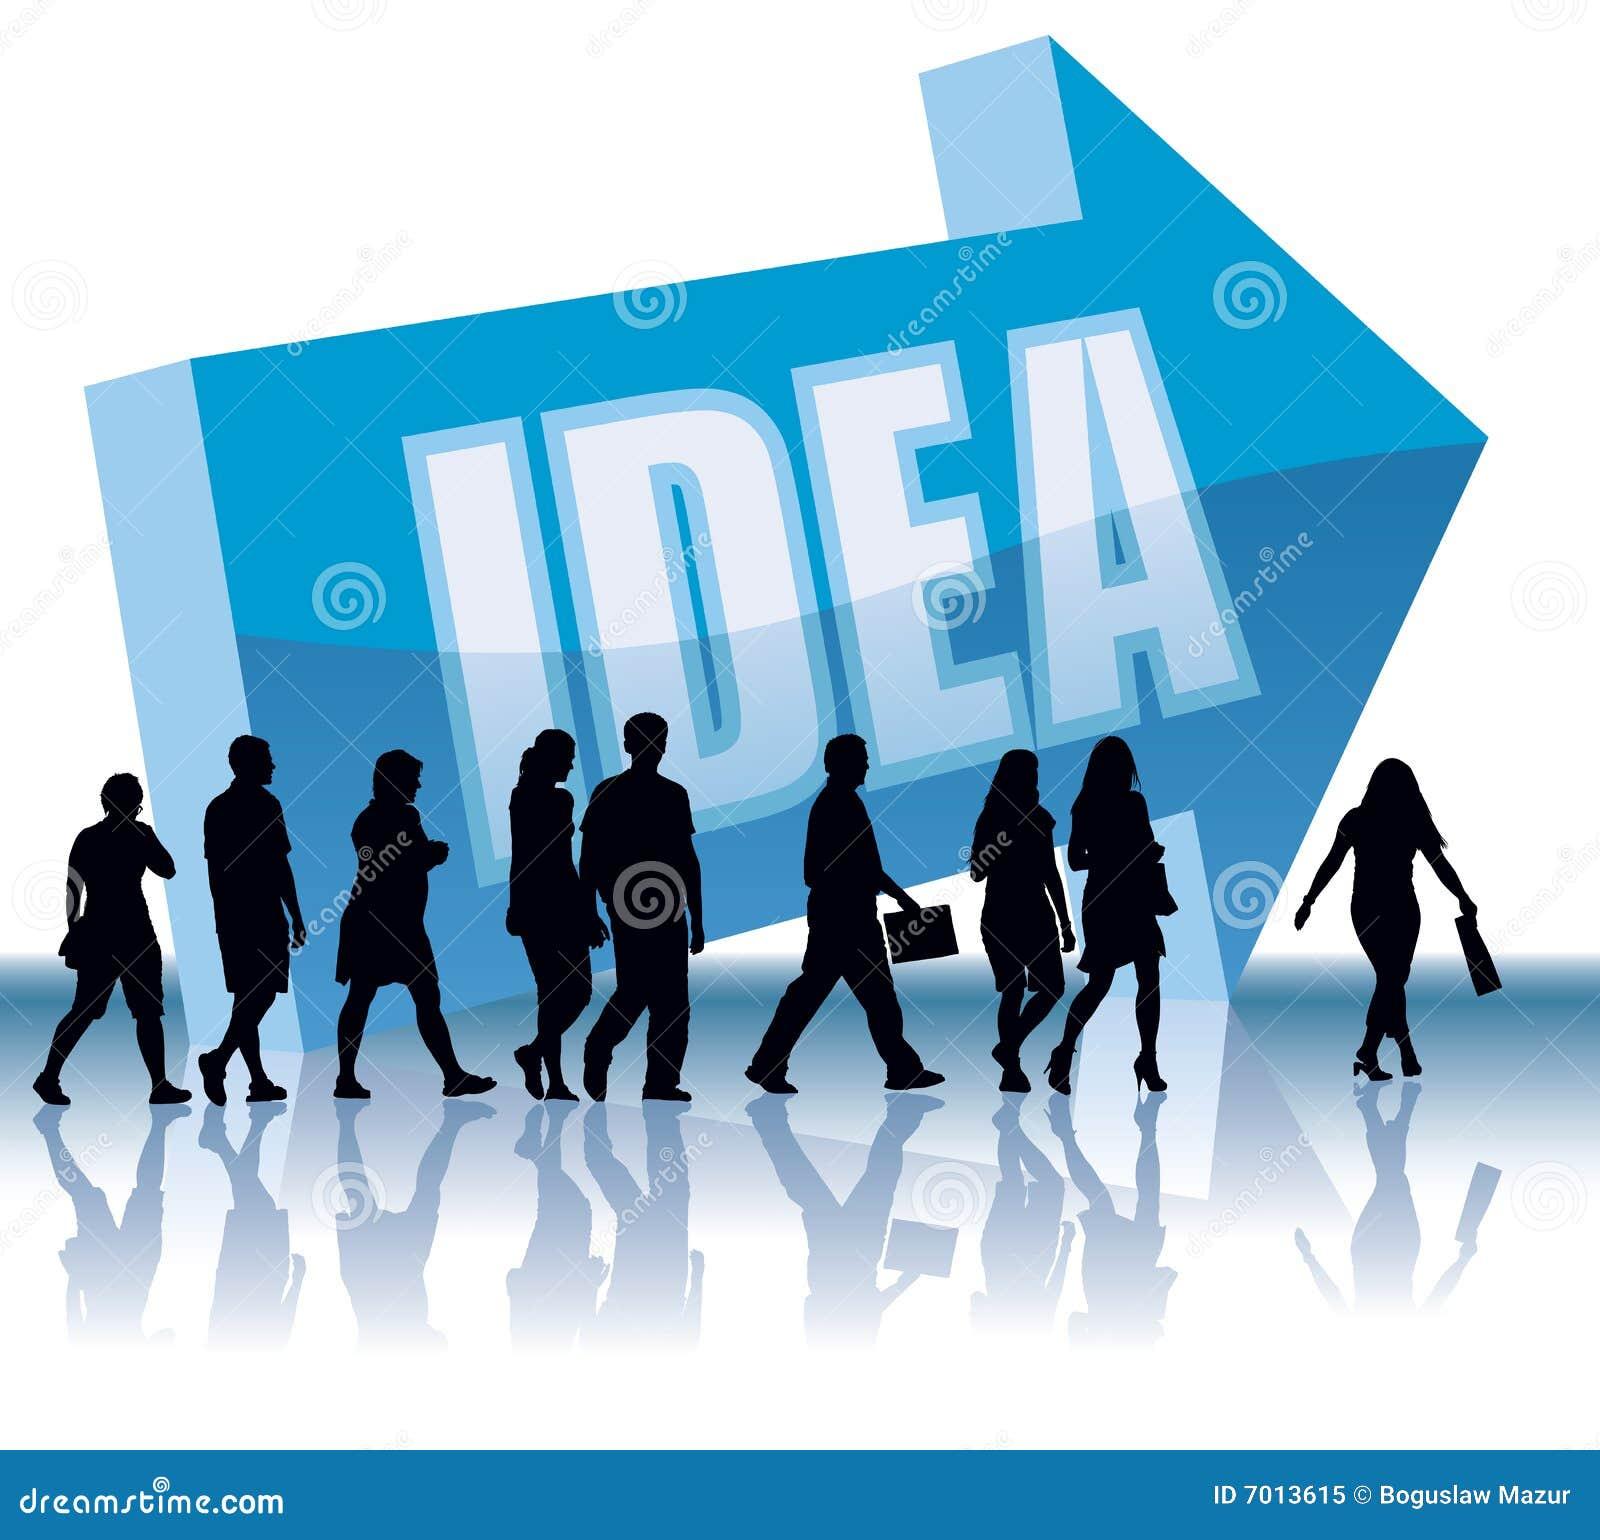 Richting - Idee